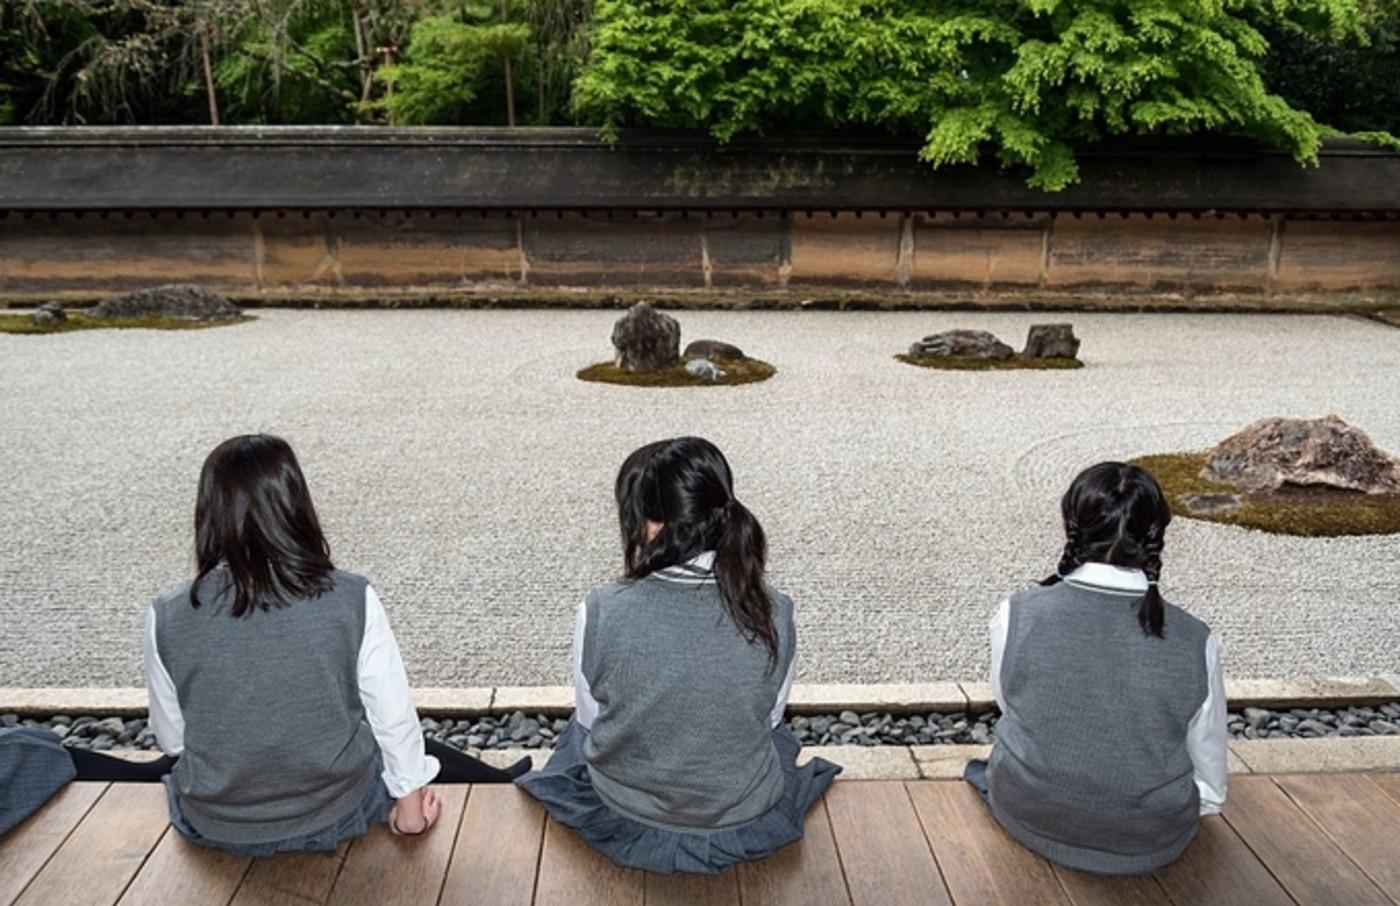 School-girls at zen rock garden, Ryoanji, Ryoan-ji Temple, Kyoto, Japan.